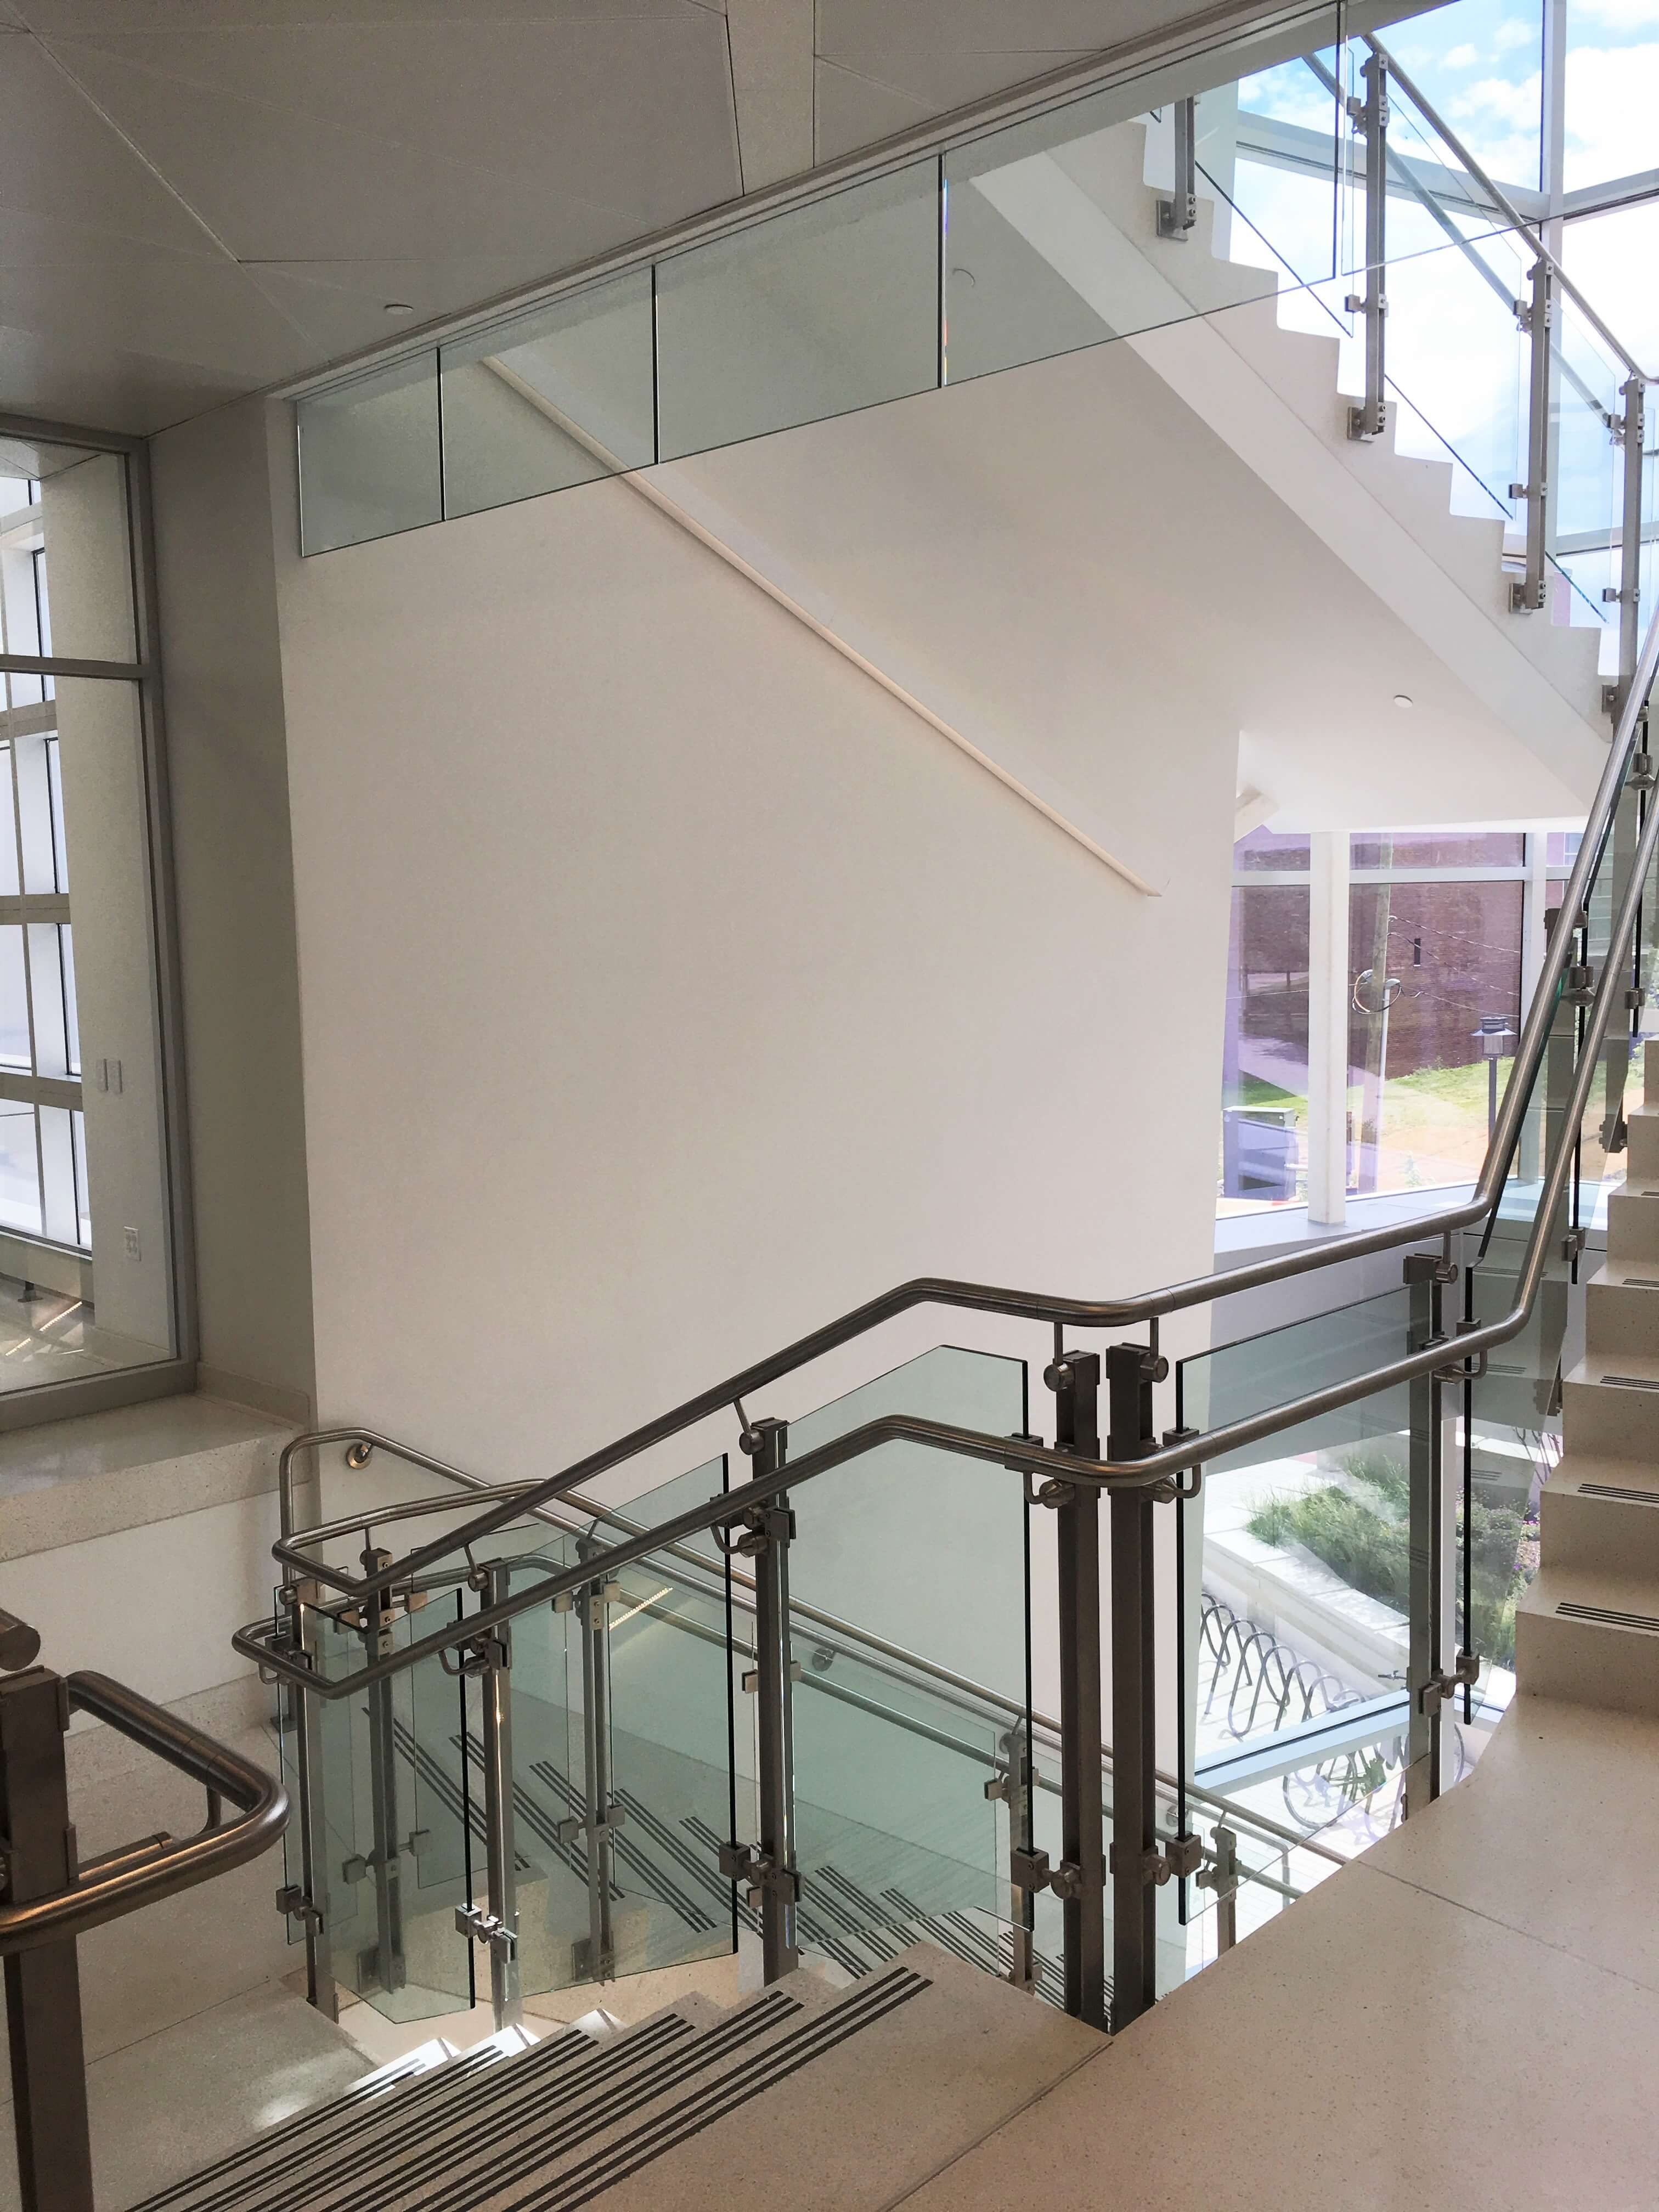 Kubit Glass Railing At Market Axess Nyc: Optik™ Smoke Baffle Photo Gallery